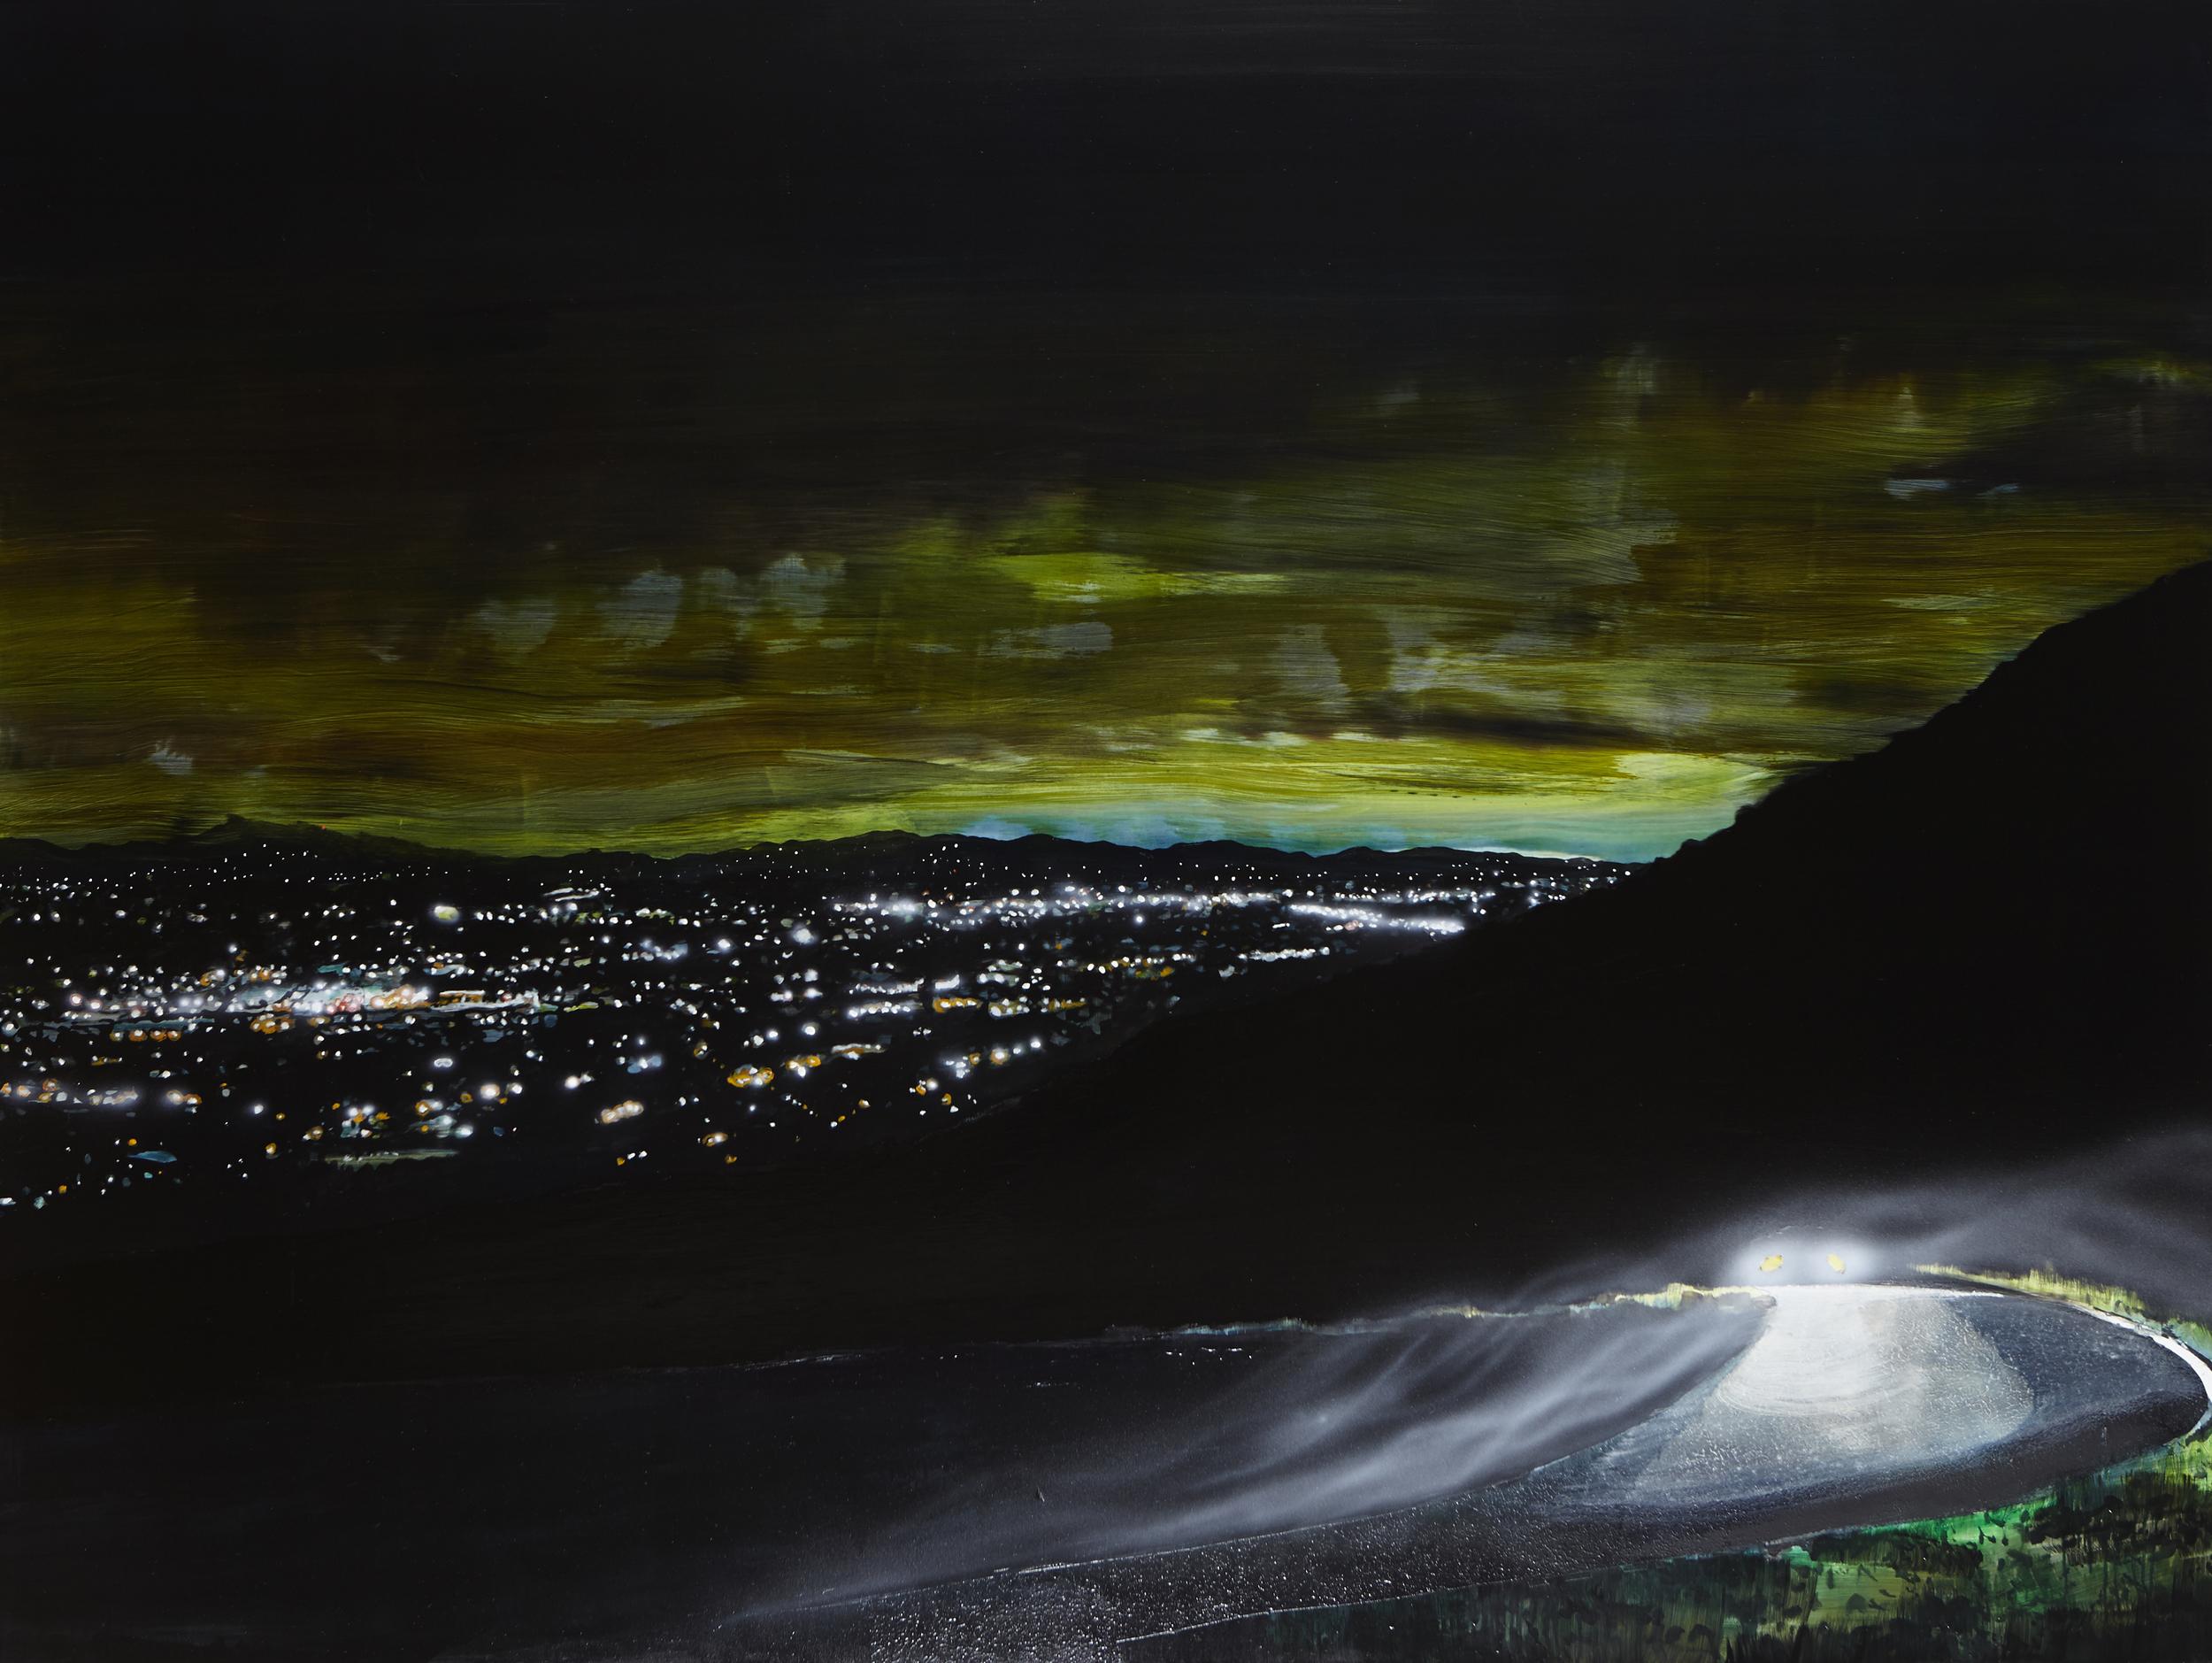 Leaving,  2014 Acrylic, oil and automotive enamel on linen 150 x 200cm